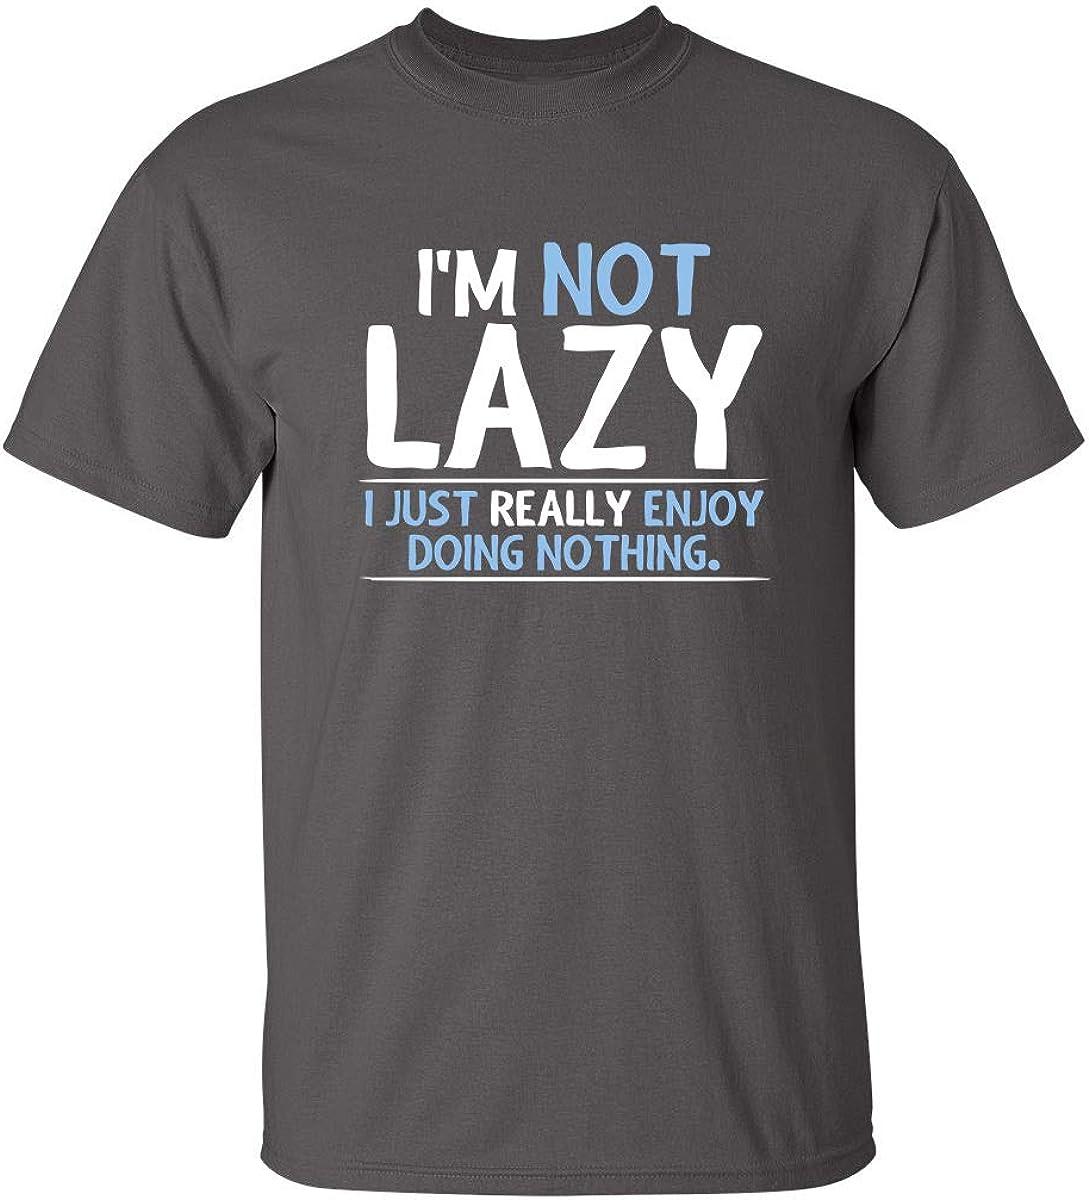 Not Lazy Enjoy Doing Nothing Graphic Novelty Sarcastic Funny T Shirt